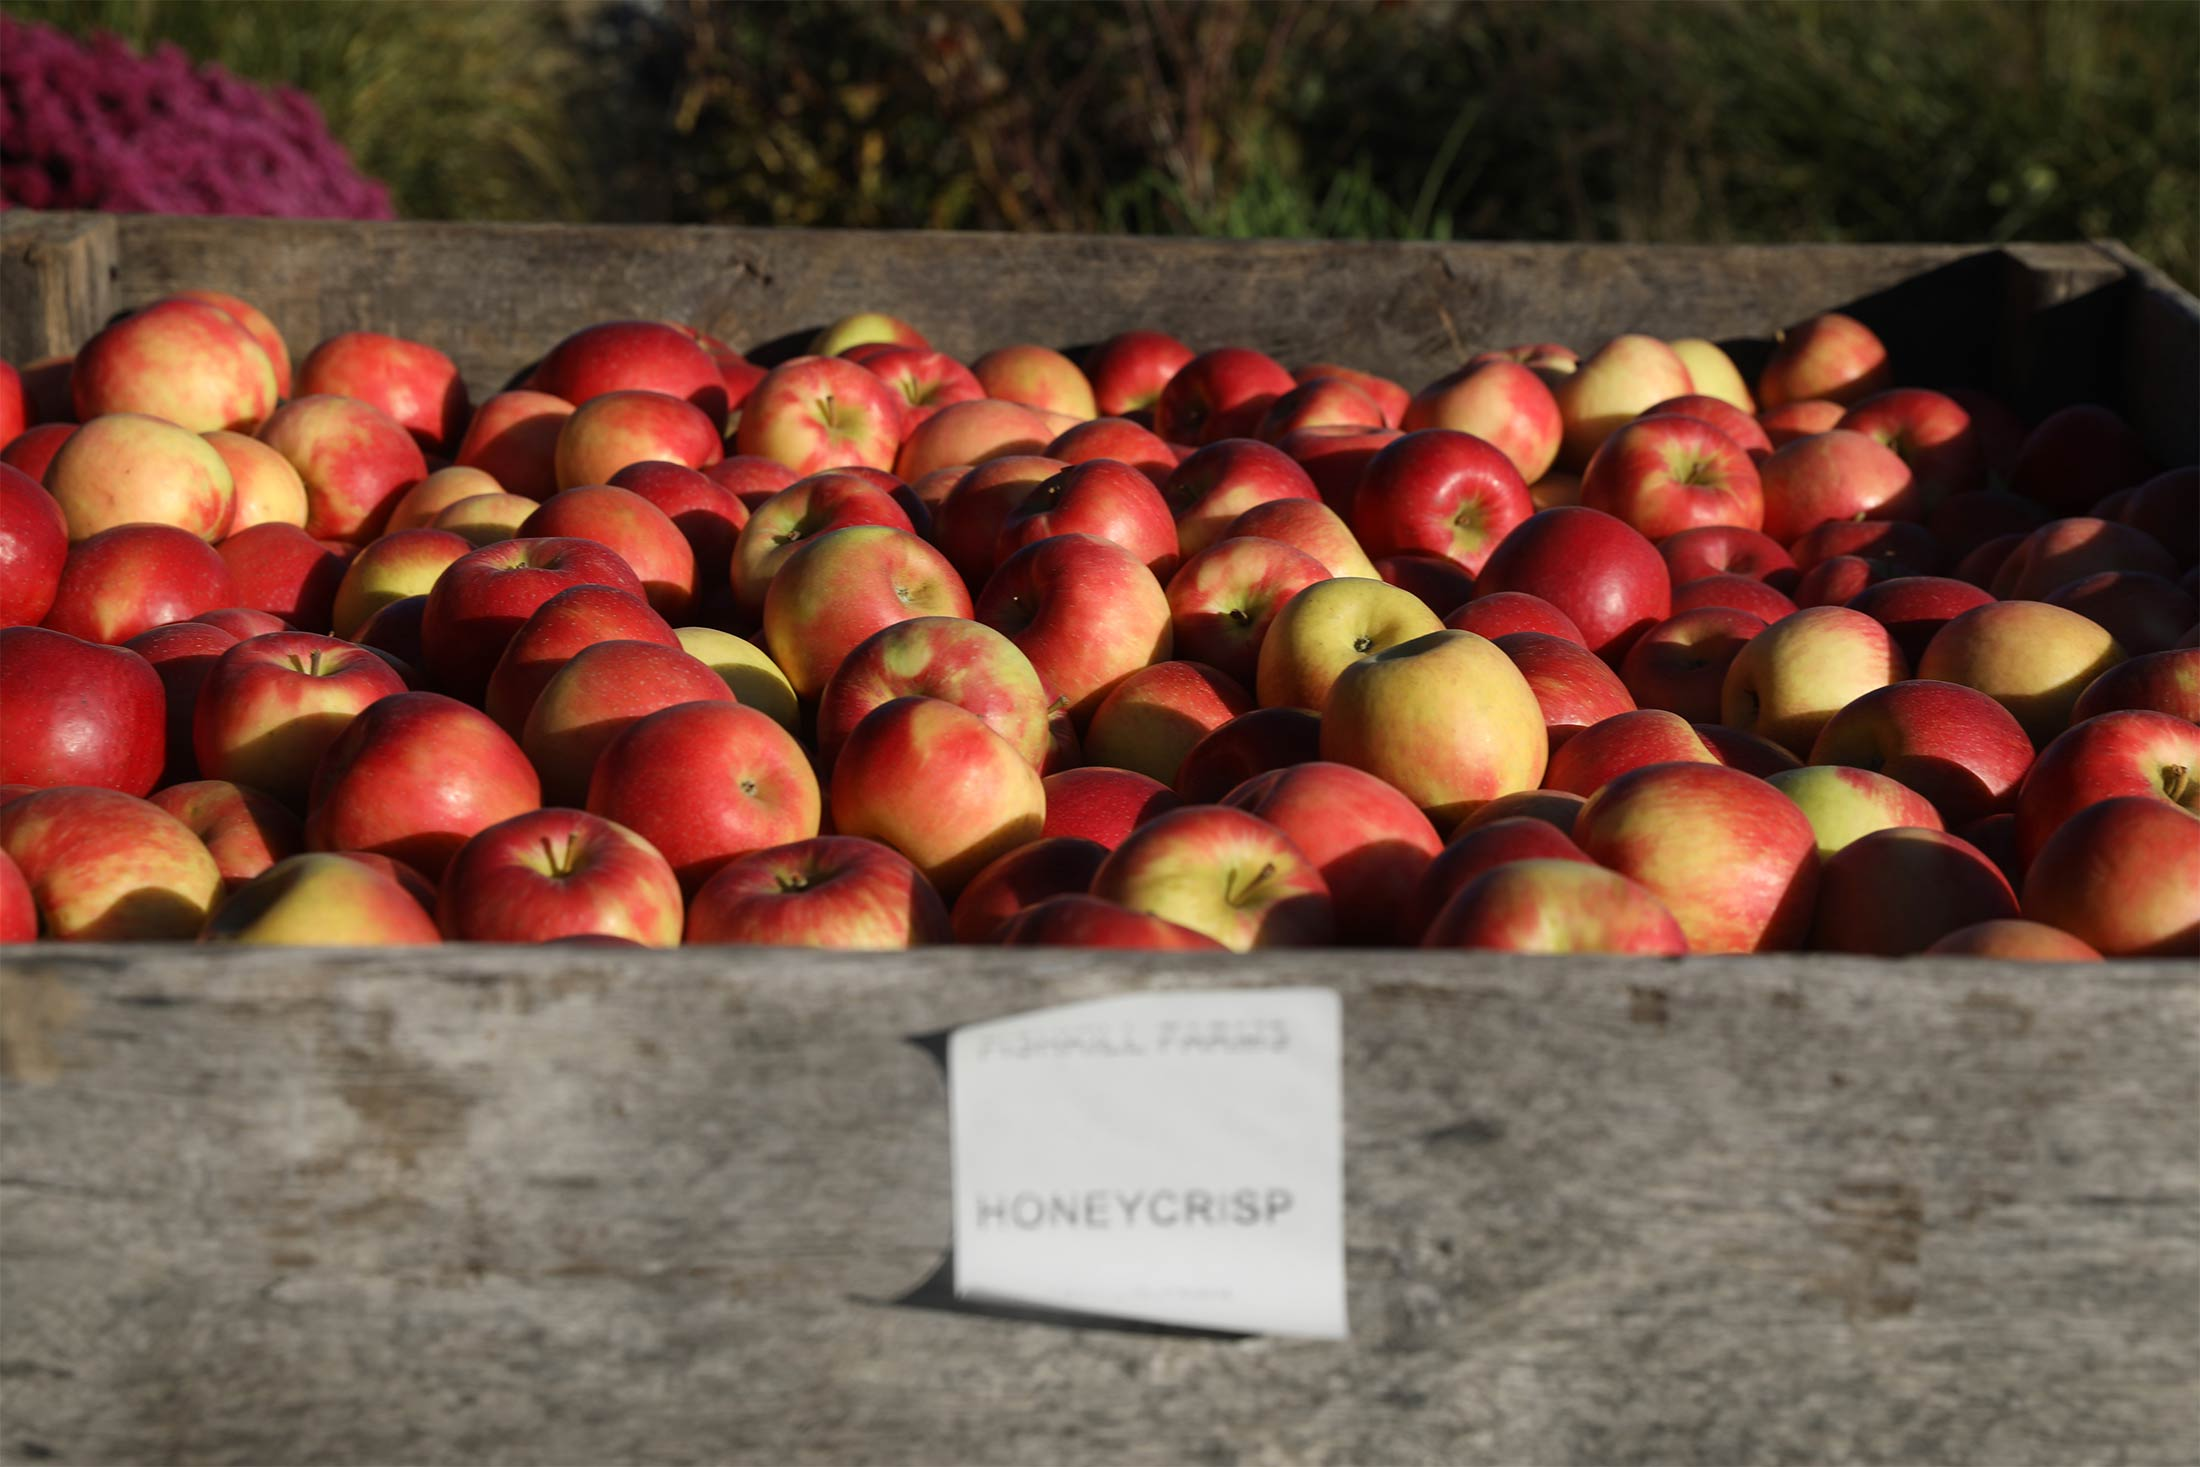 bloomberg.com - Deena Shanker - The Curse of the Honeycrisp Apple